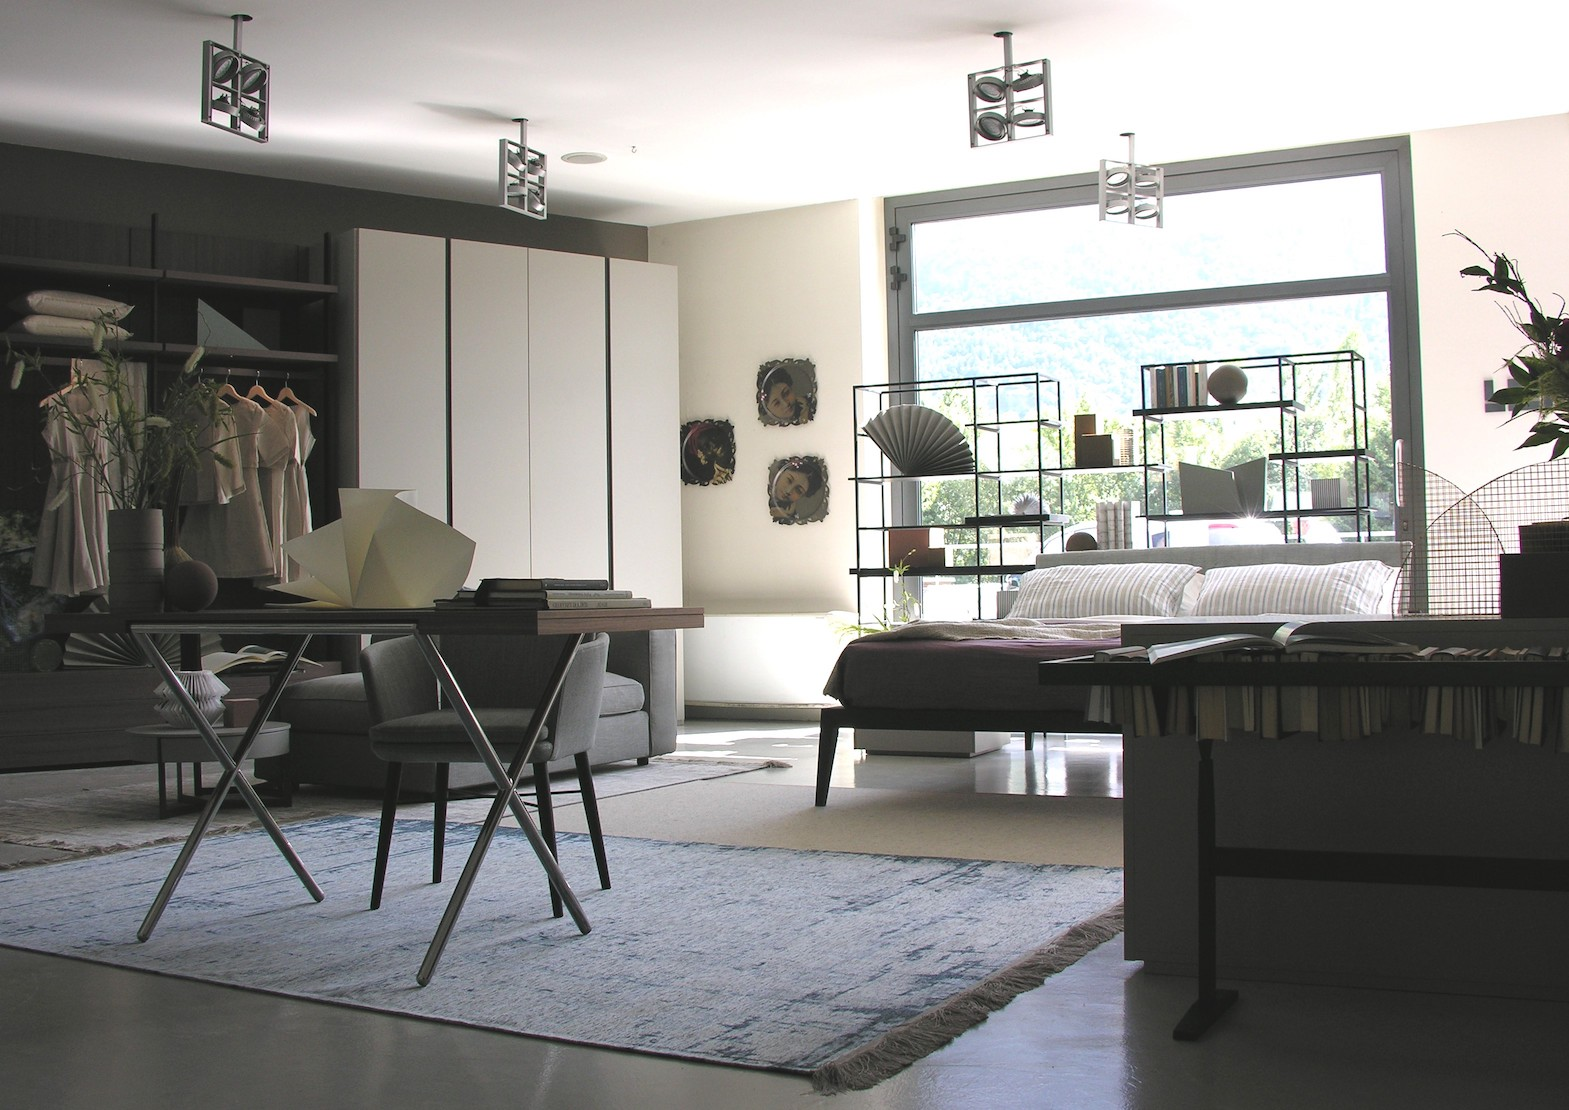 Mobili Zalf Prezzi.Casa Piu Aosta Outlet Mobili Scopri Tutte Nostre